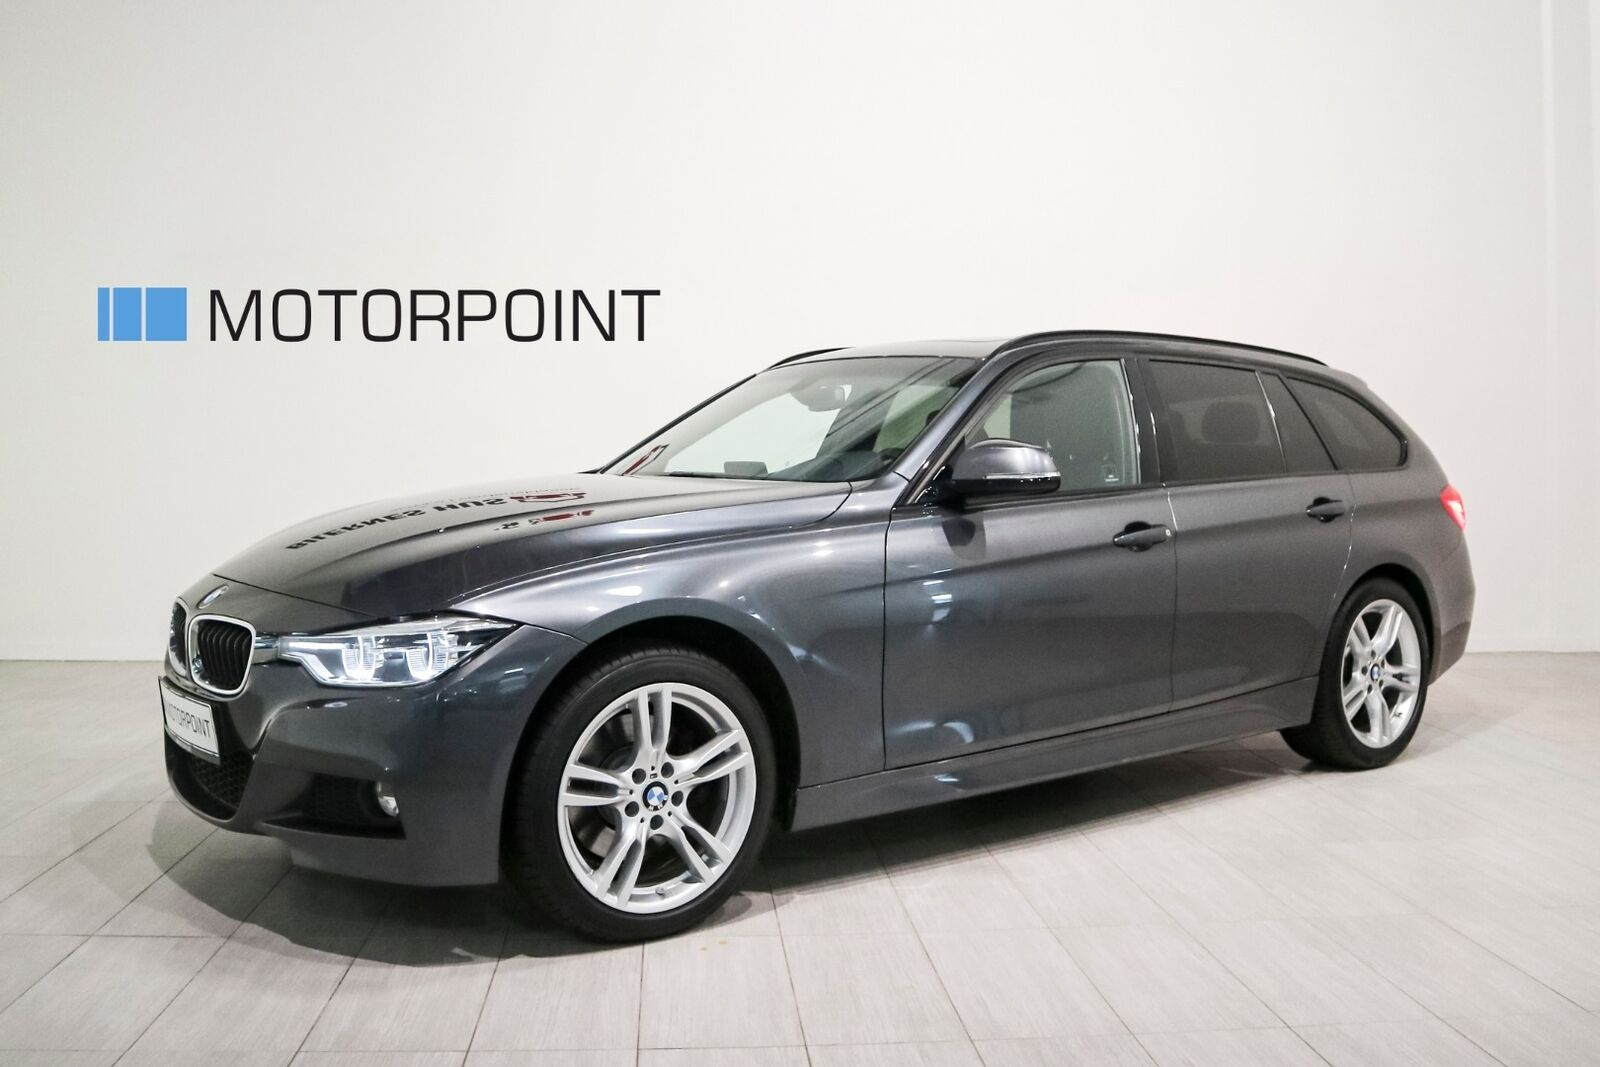 BMW 330i 2,0 Touring M-Sport xDrive aut. 5d - 399.900 kr.